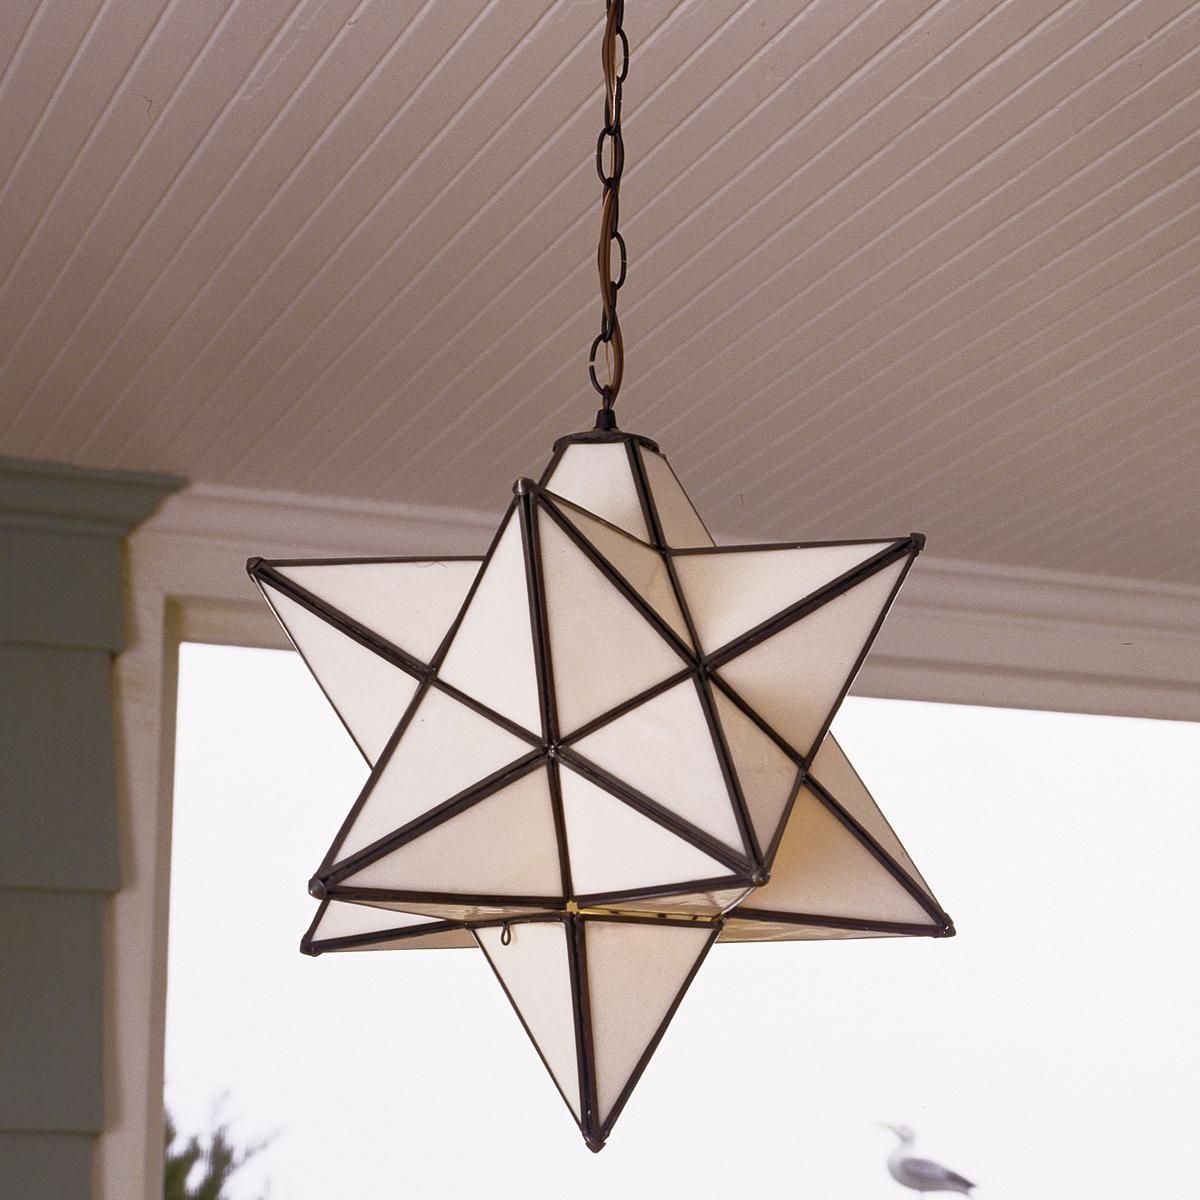 Superior Moravian Star Hanging Light Indoor Outdoor Hanging Light Fixtures Hanging Porch Lights Hanging Lights